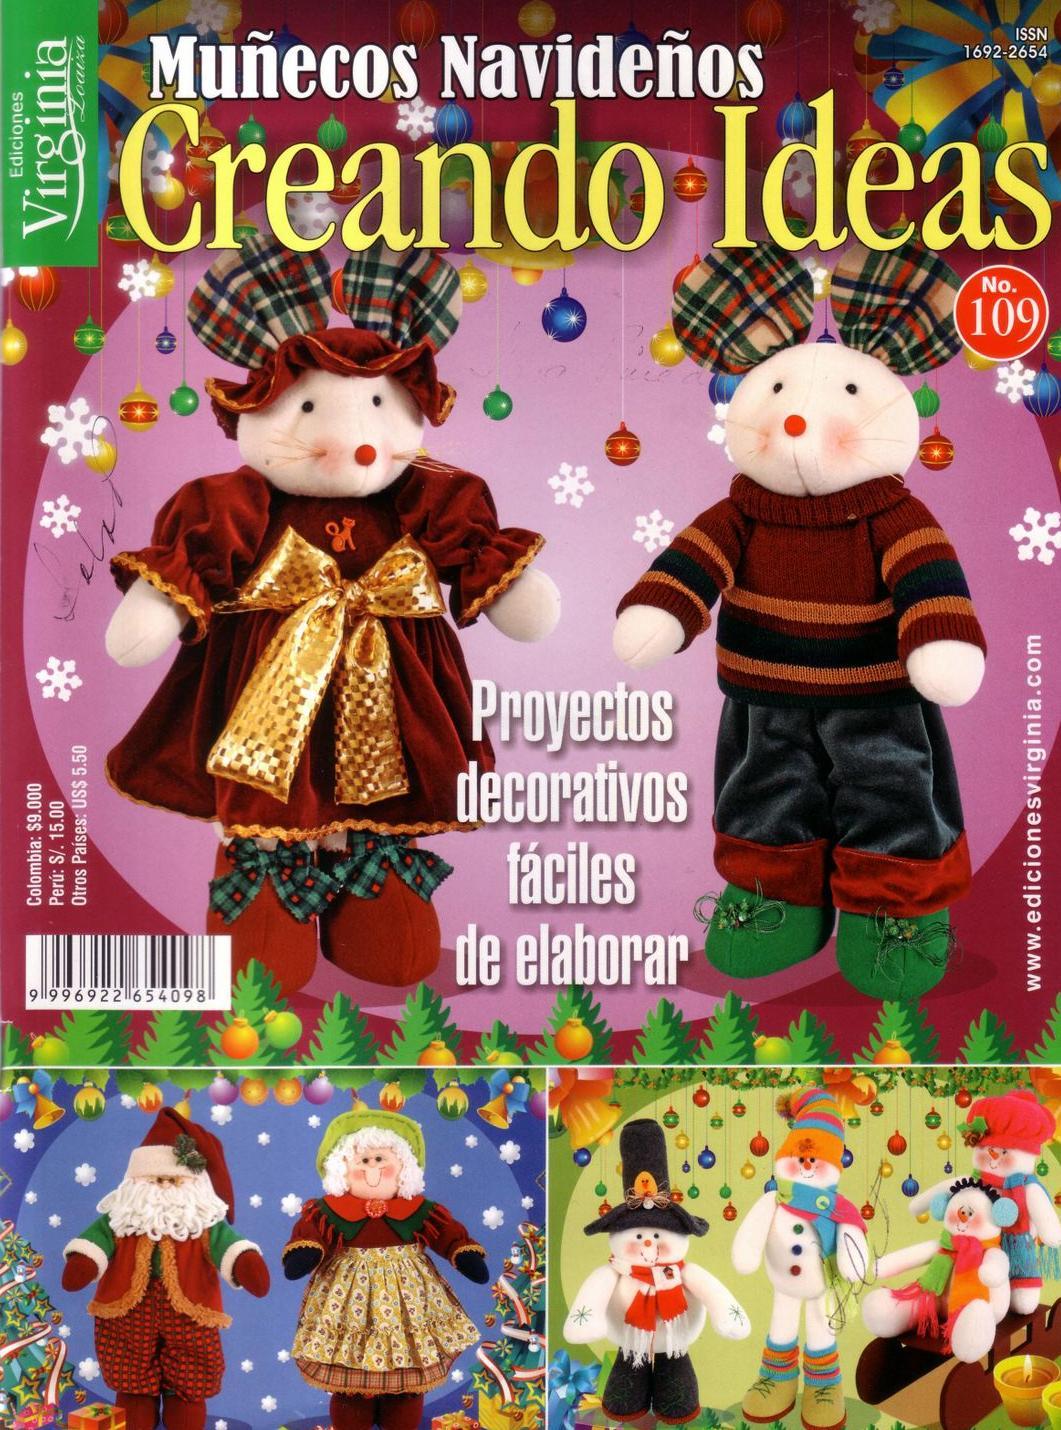 Revistas de manualidades gratis creando ideas mu ecos de - Manualidades munecos de navidad ...